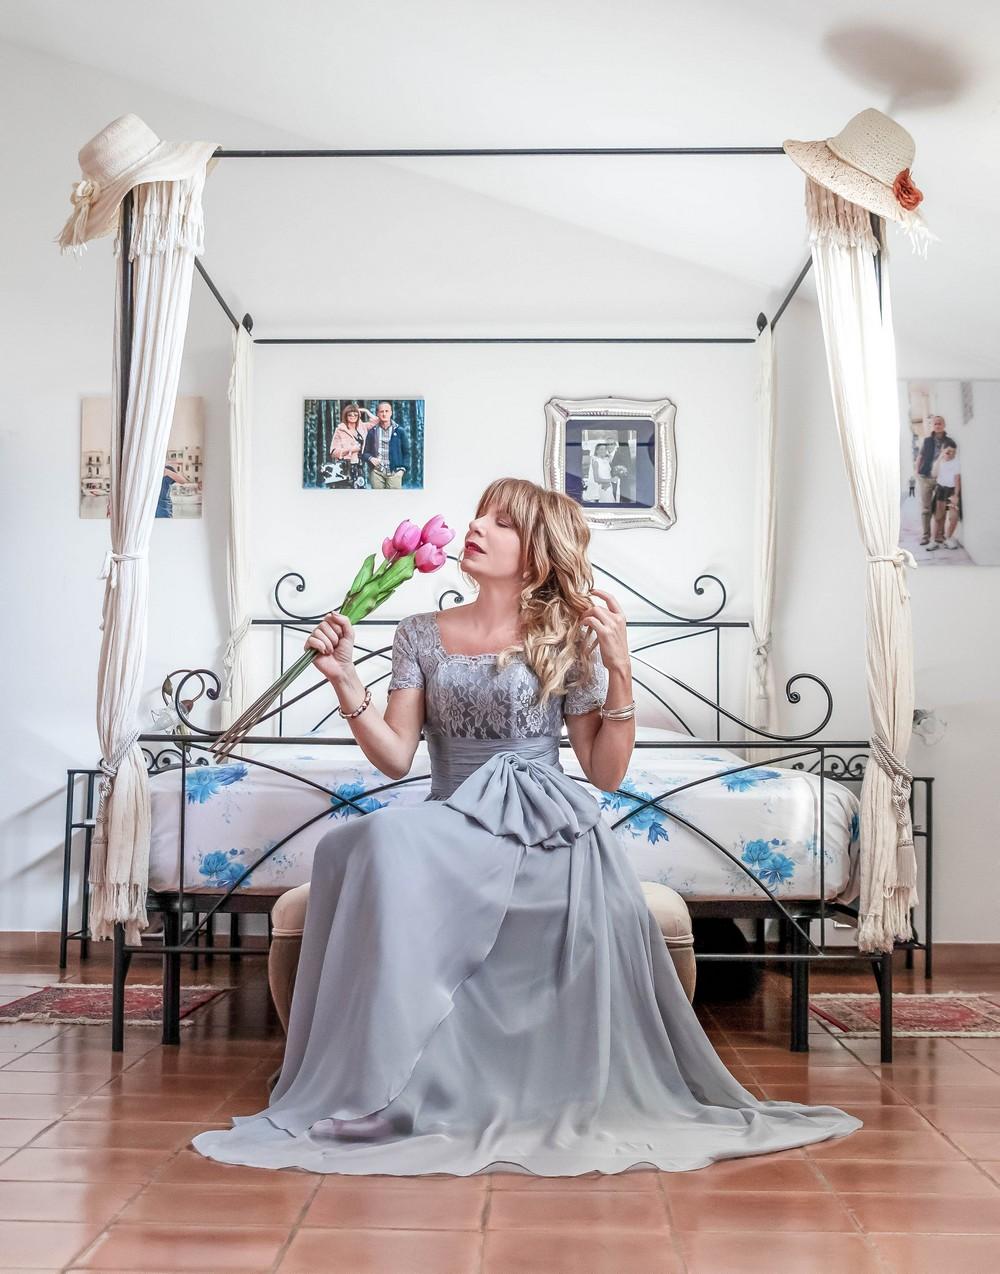 Francesca Romana Capizzi